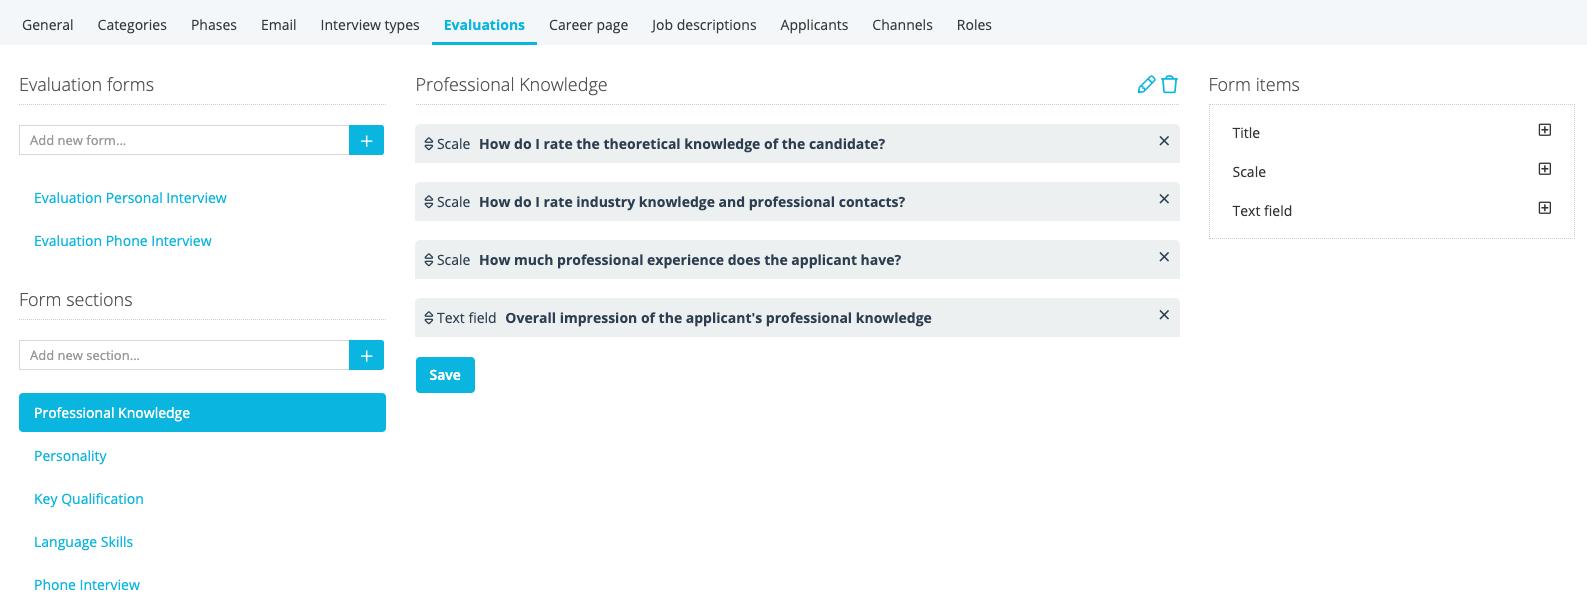 Questionnaire-Settings-Sections_en-us.png